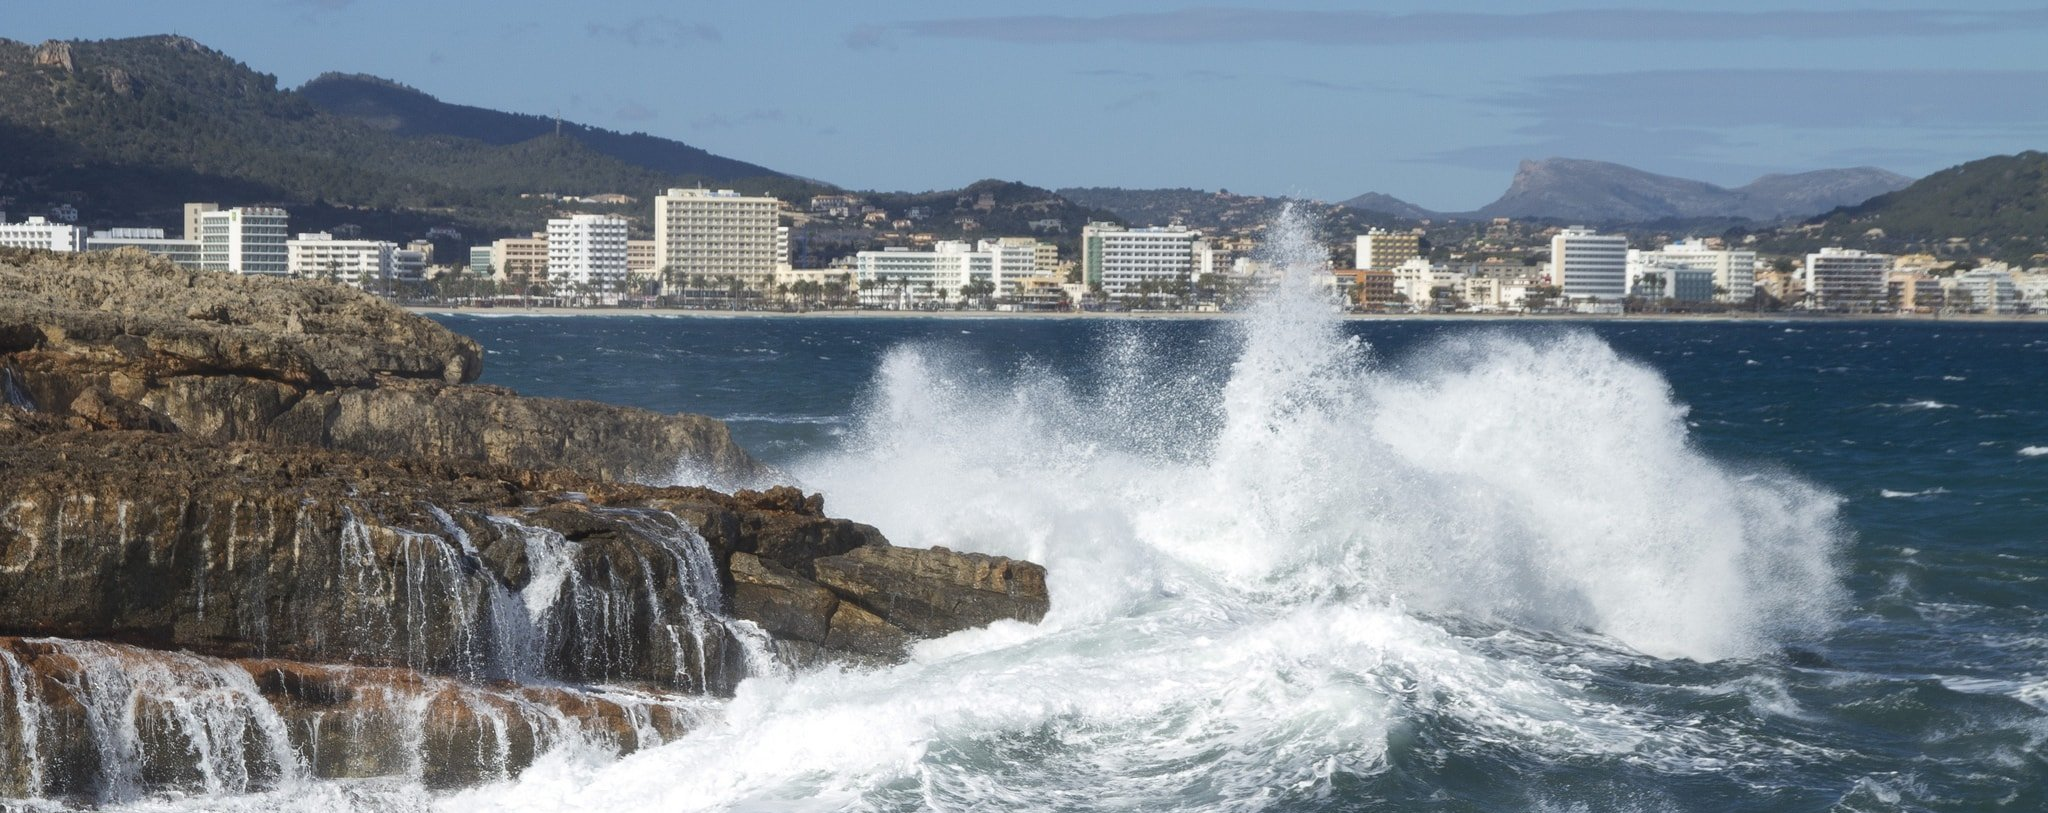 Son Servera property seafront.